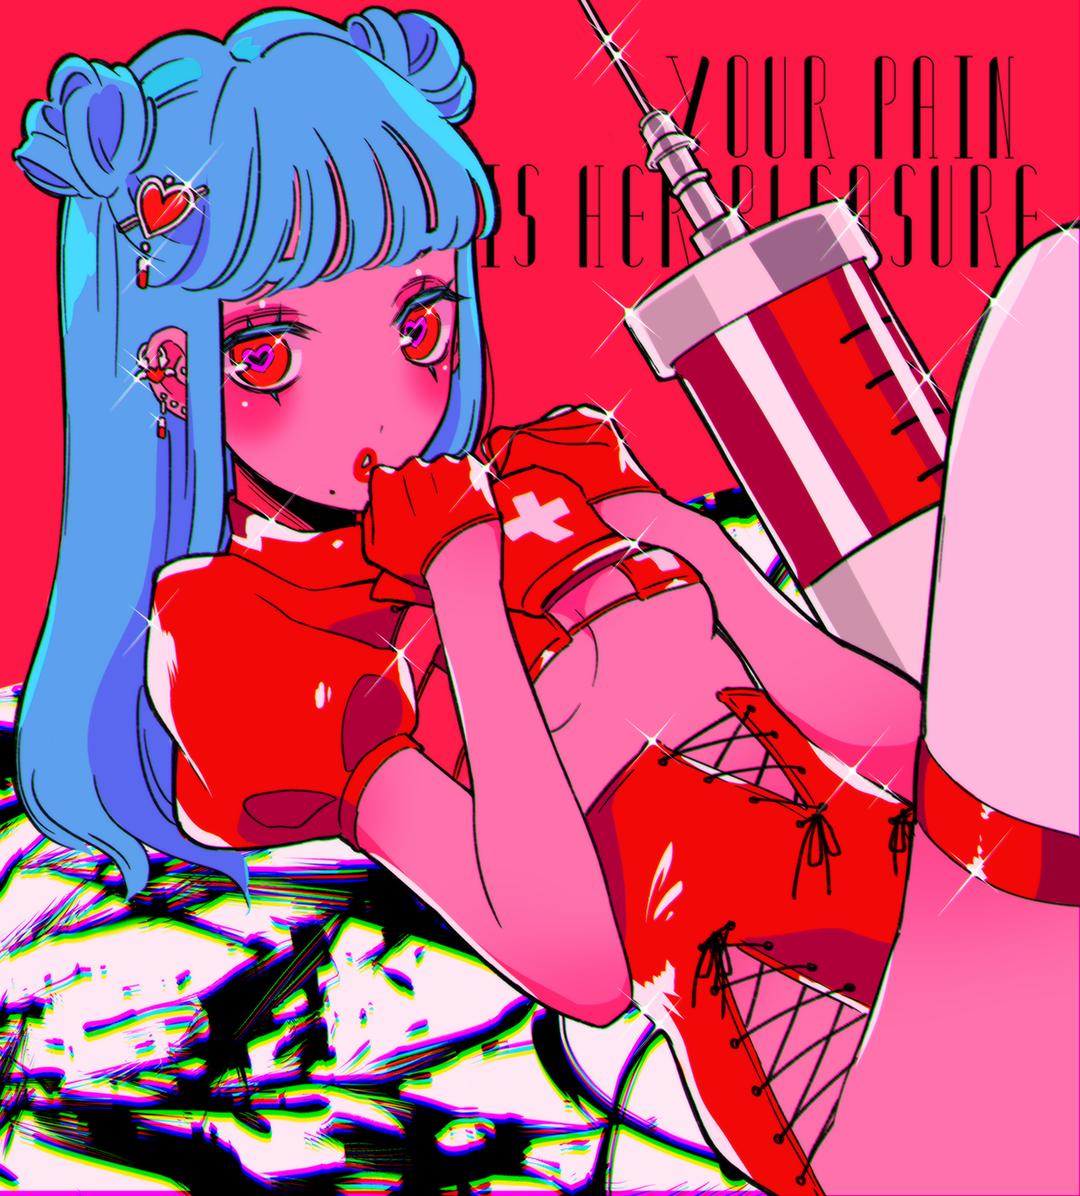 GirlsclubAsia-Artist-Eirlysie- Zi_Qing_Li-7